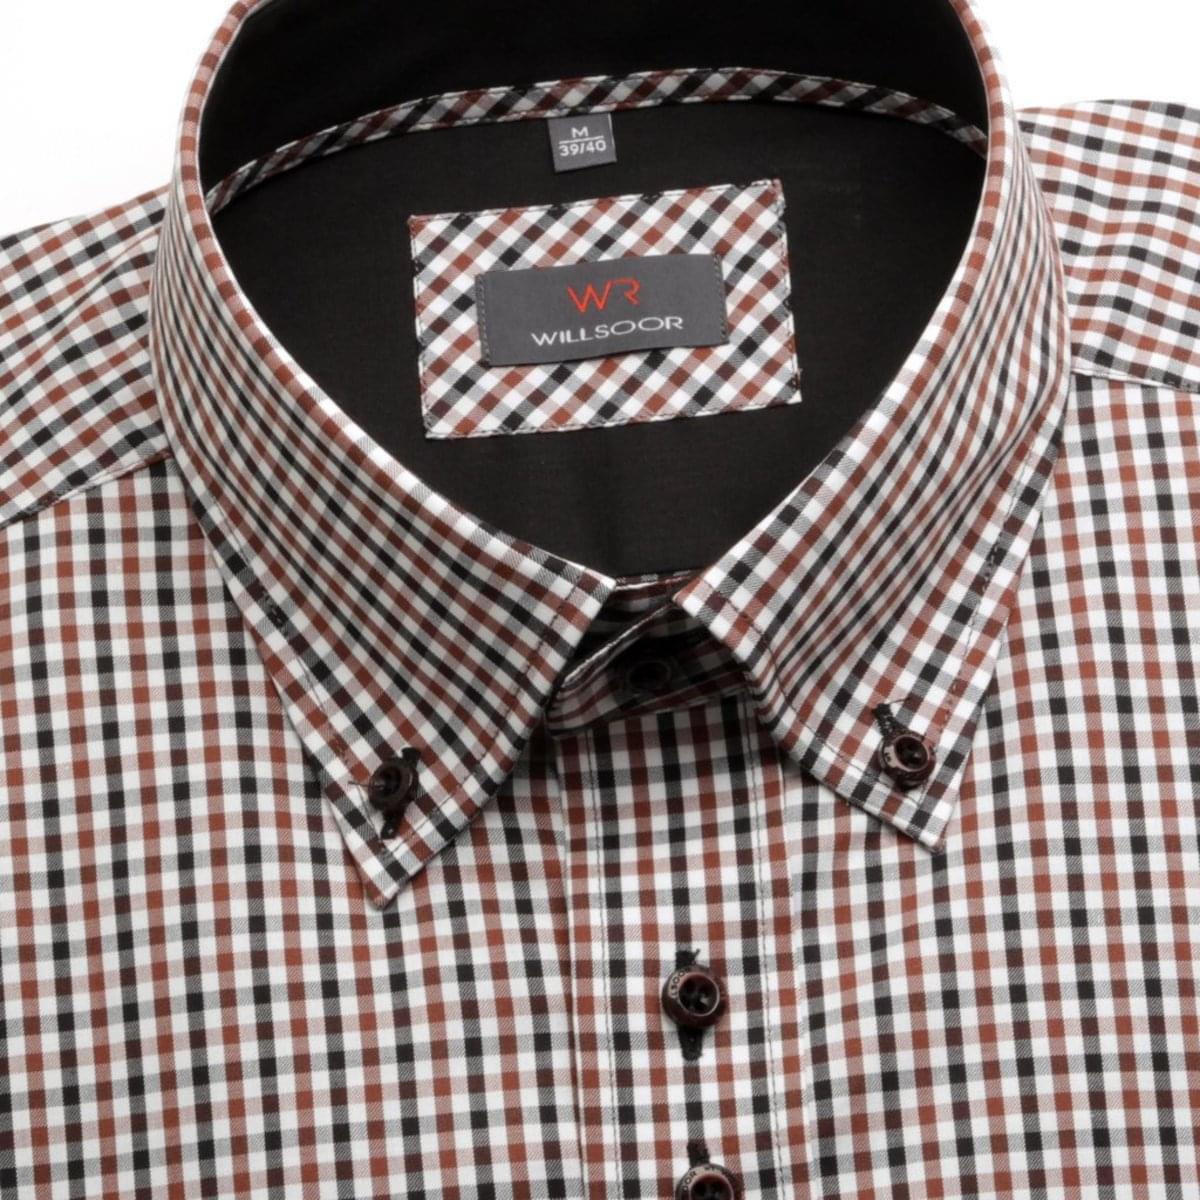 Košile WR Slim Fit (výška 164-170) 4306 164-170 / XL (43/44) 176-182 / XL (43/44)